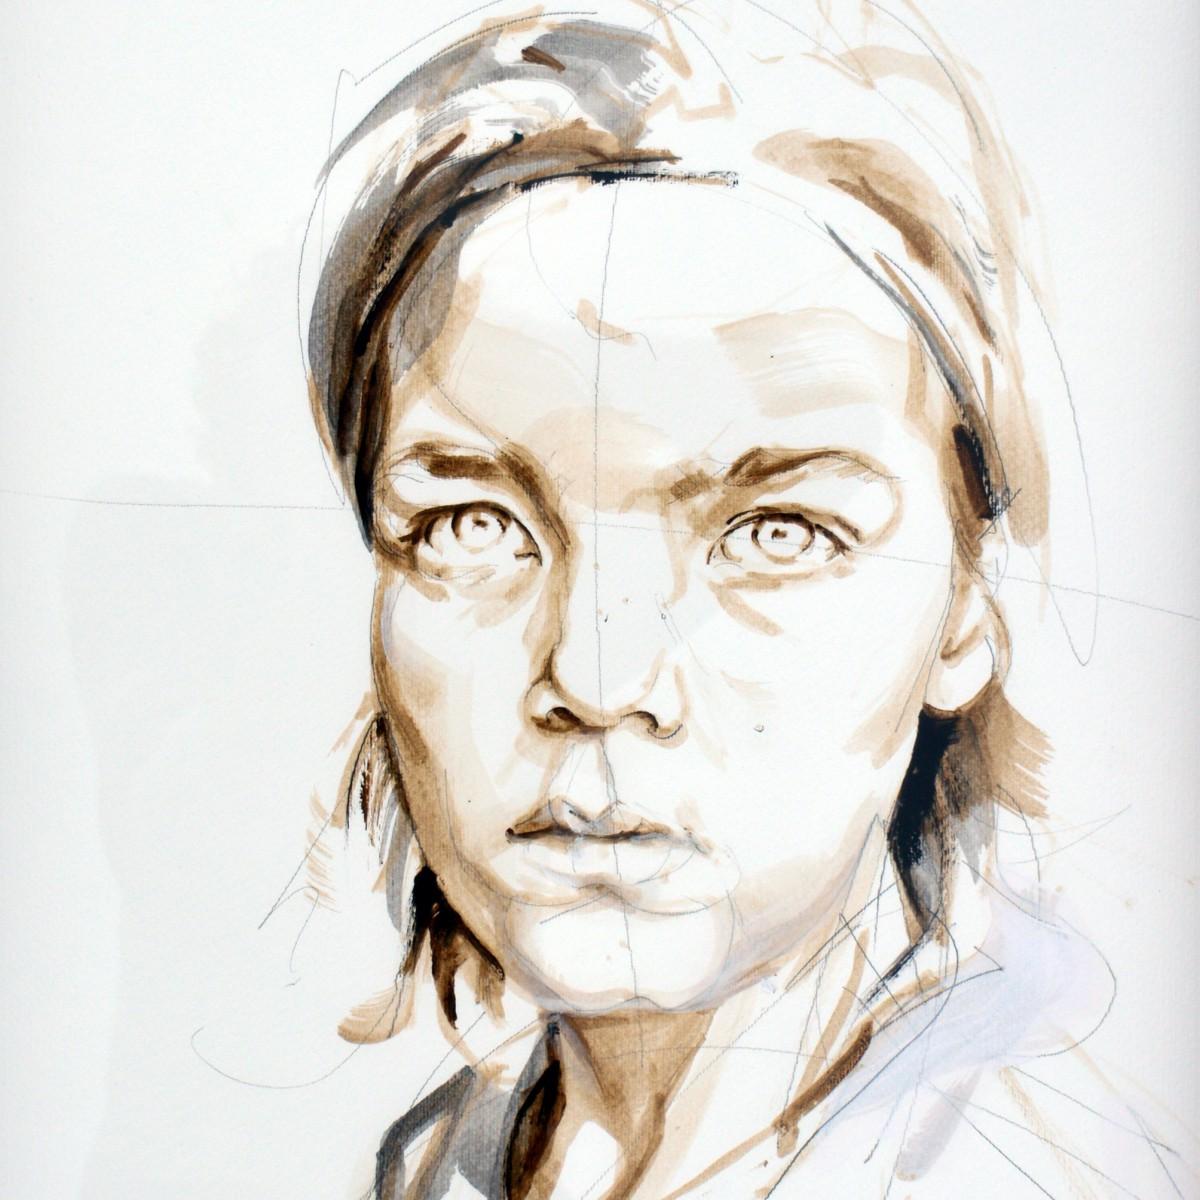 koetziervanhooff-portret-jeppe-sq-2015